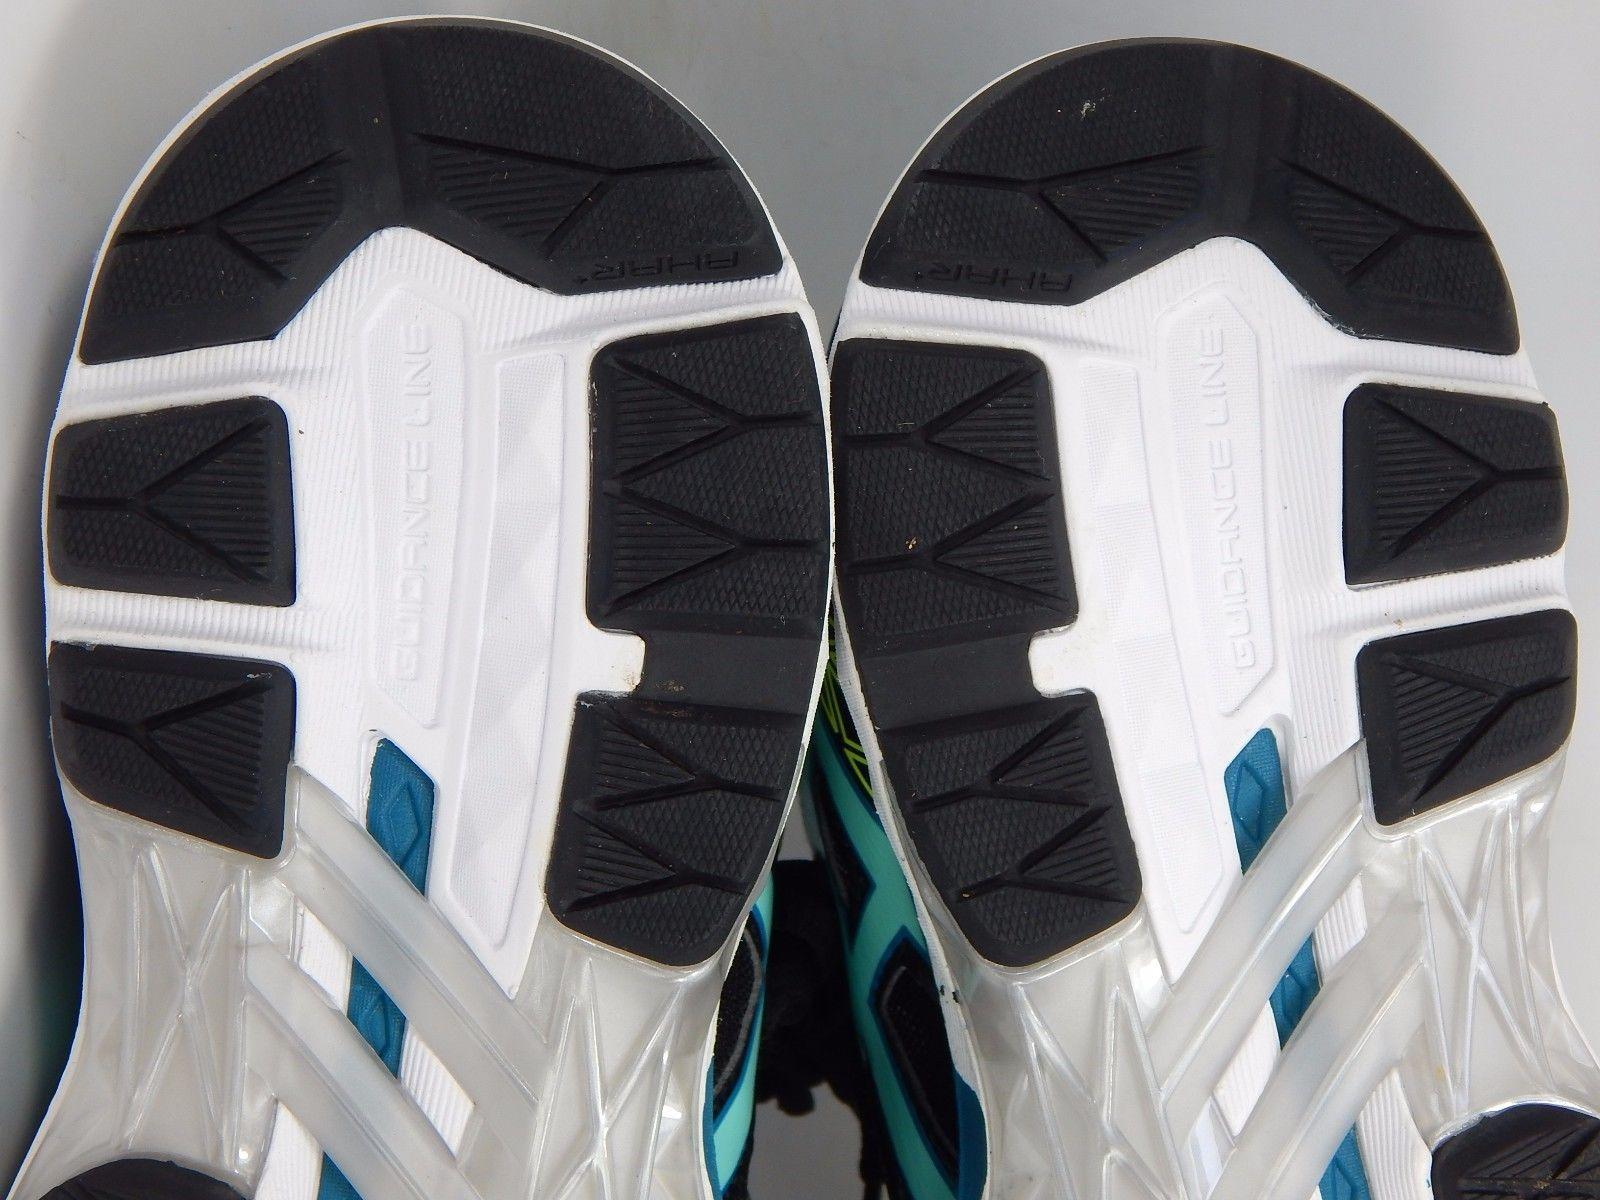 Asics GT 2000 v 4 Women's Running Shoes Size US 7 M (B) EU 38 Black Blue T656N